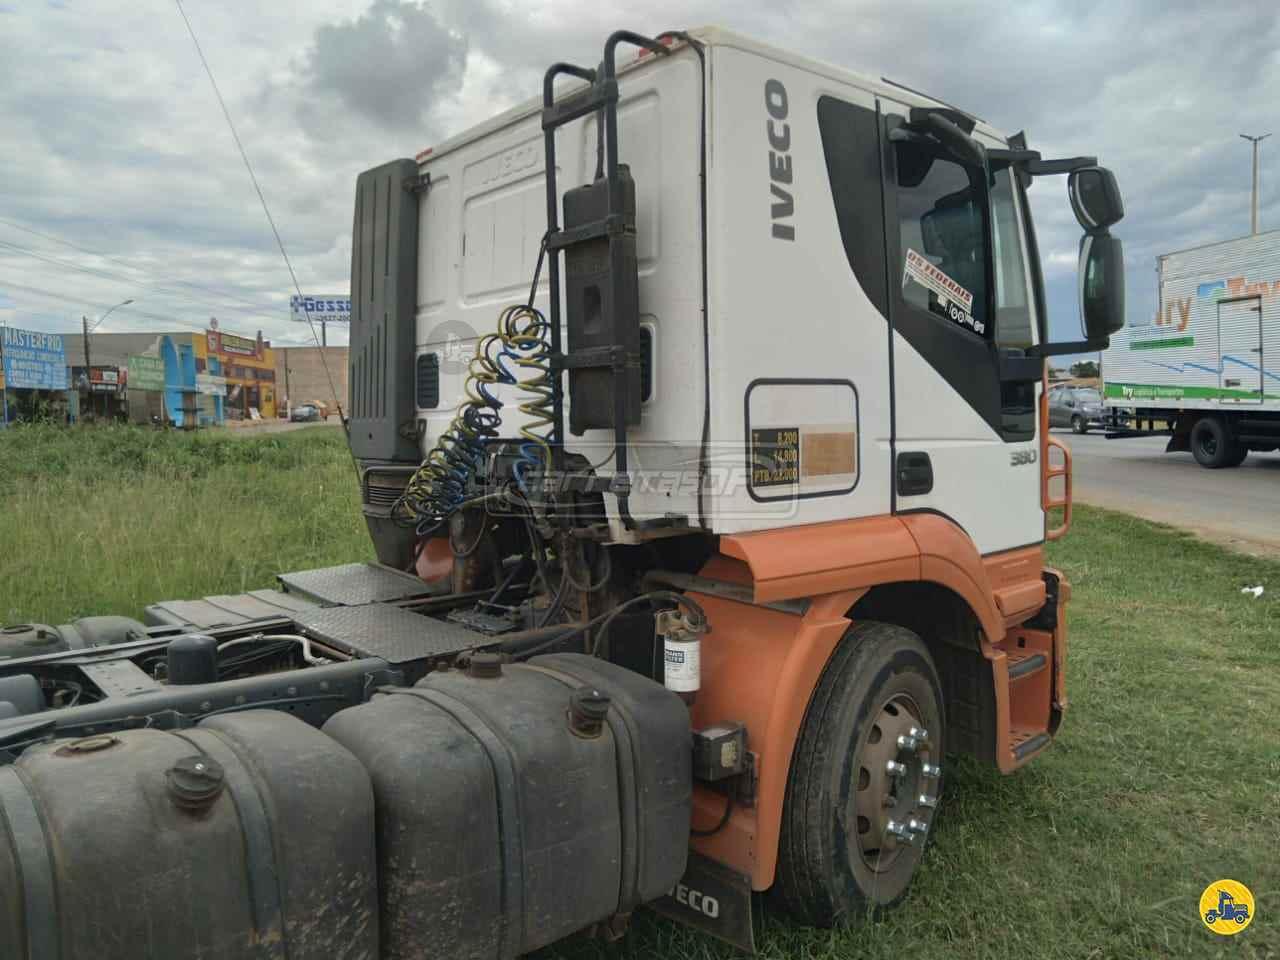 CAMINHAO IVECO STRALIS 380 Cavalo Mecânico Truck 6x2 CARRETAS DF - NOMA BRASILIA DISTRITO FEDERAL DF